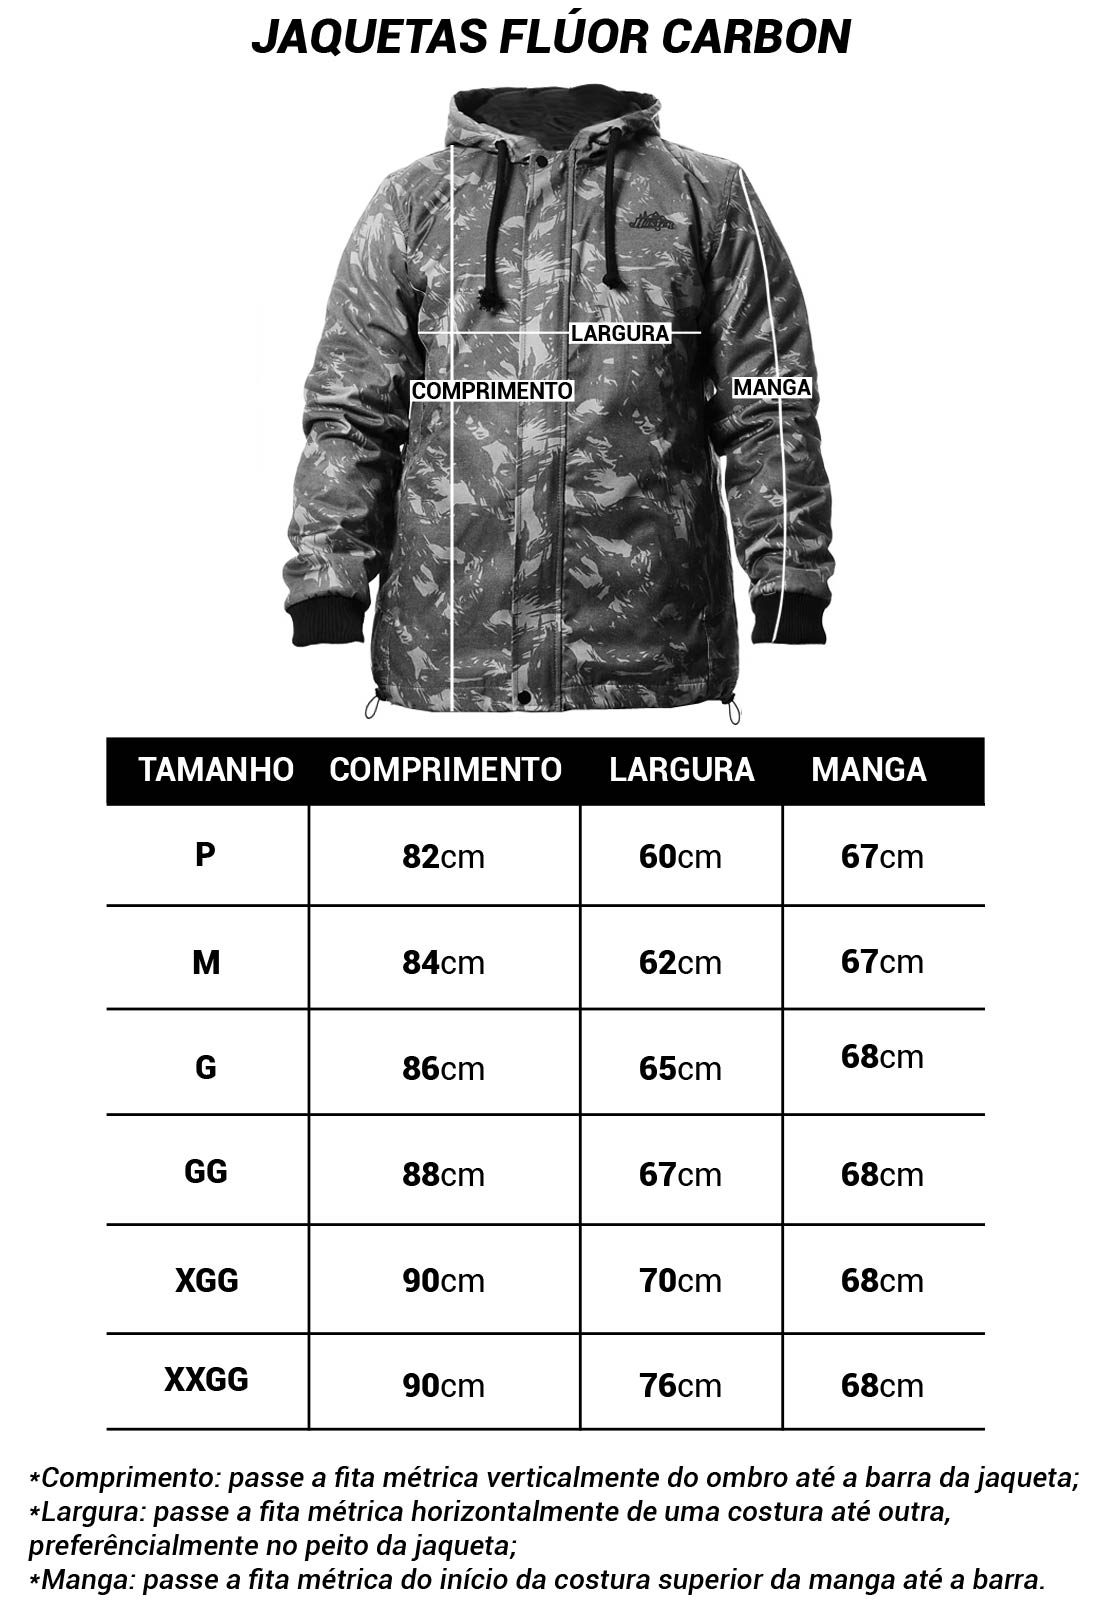 JAQUETA CAMUFLADA PALHADA FLÚOR CARBON MASCULINA  - Real Hunter